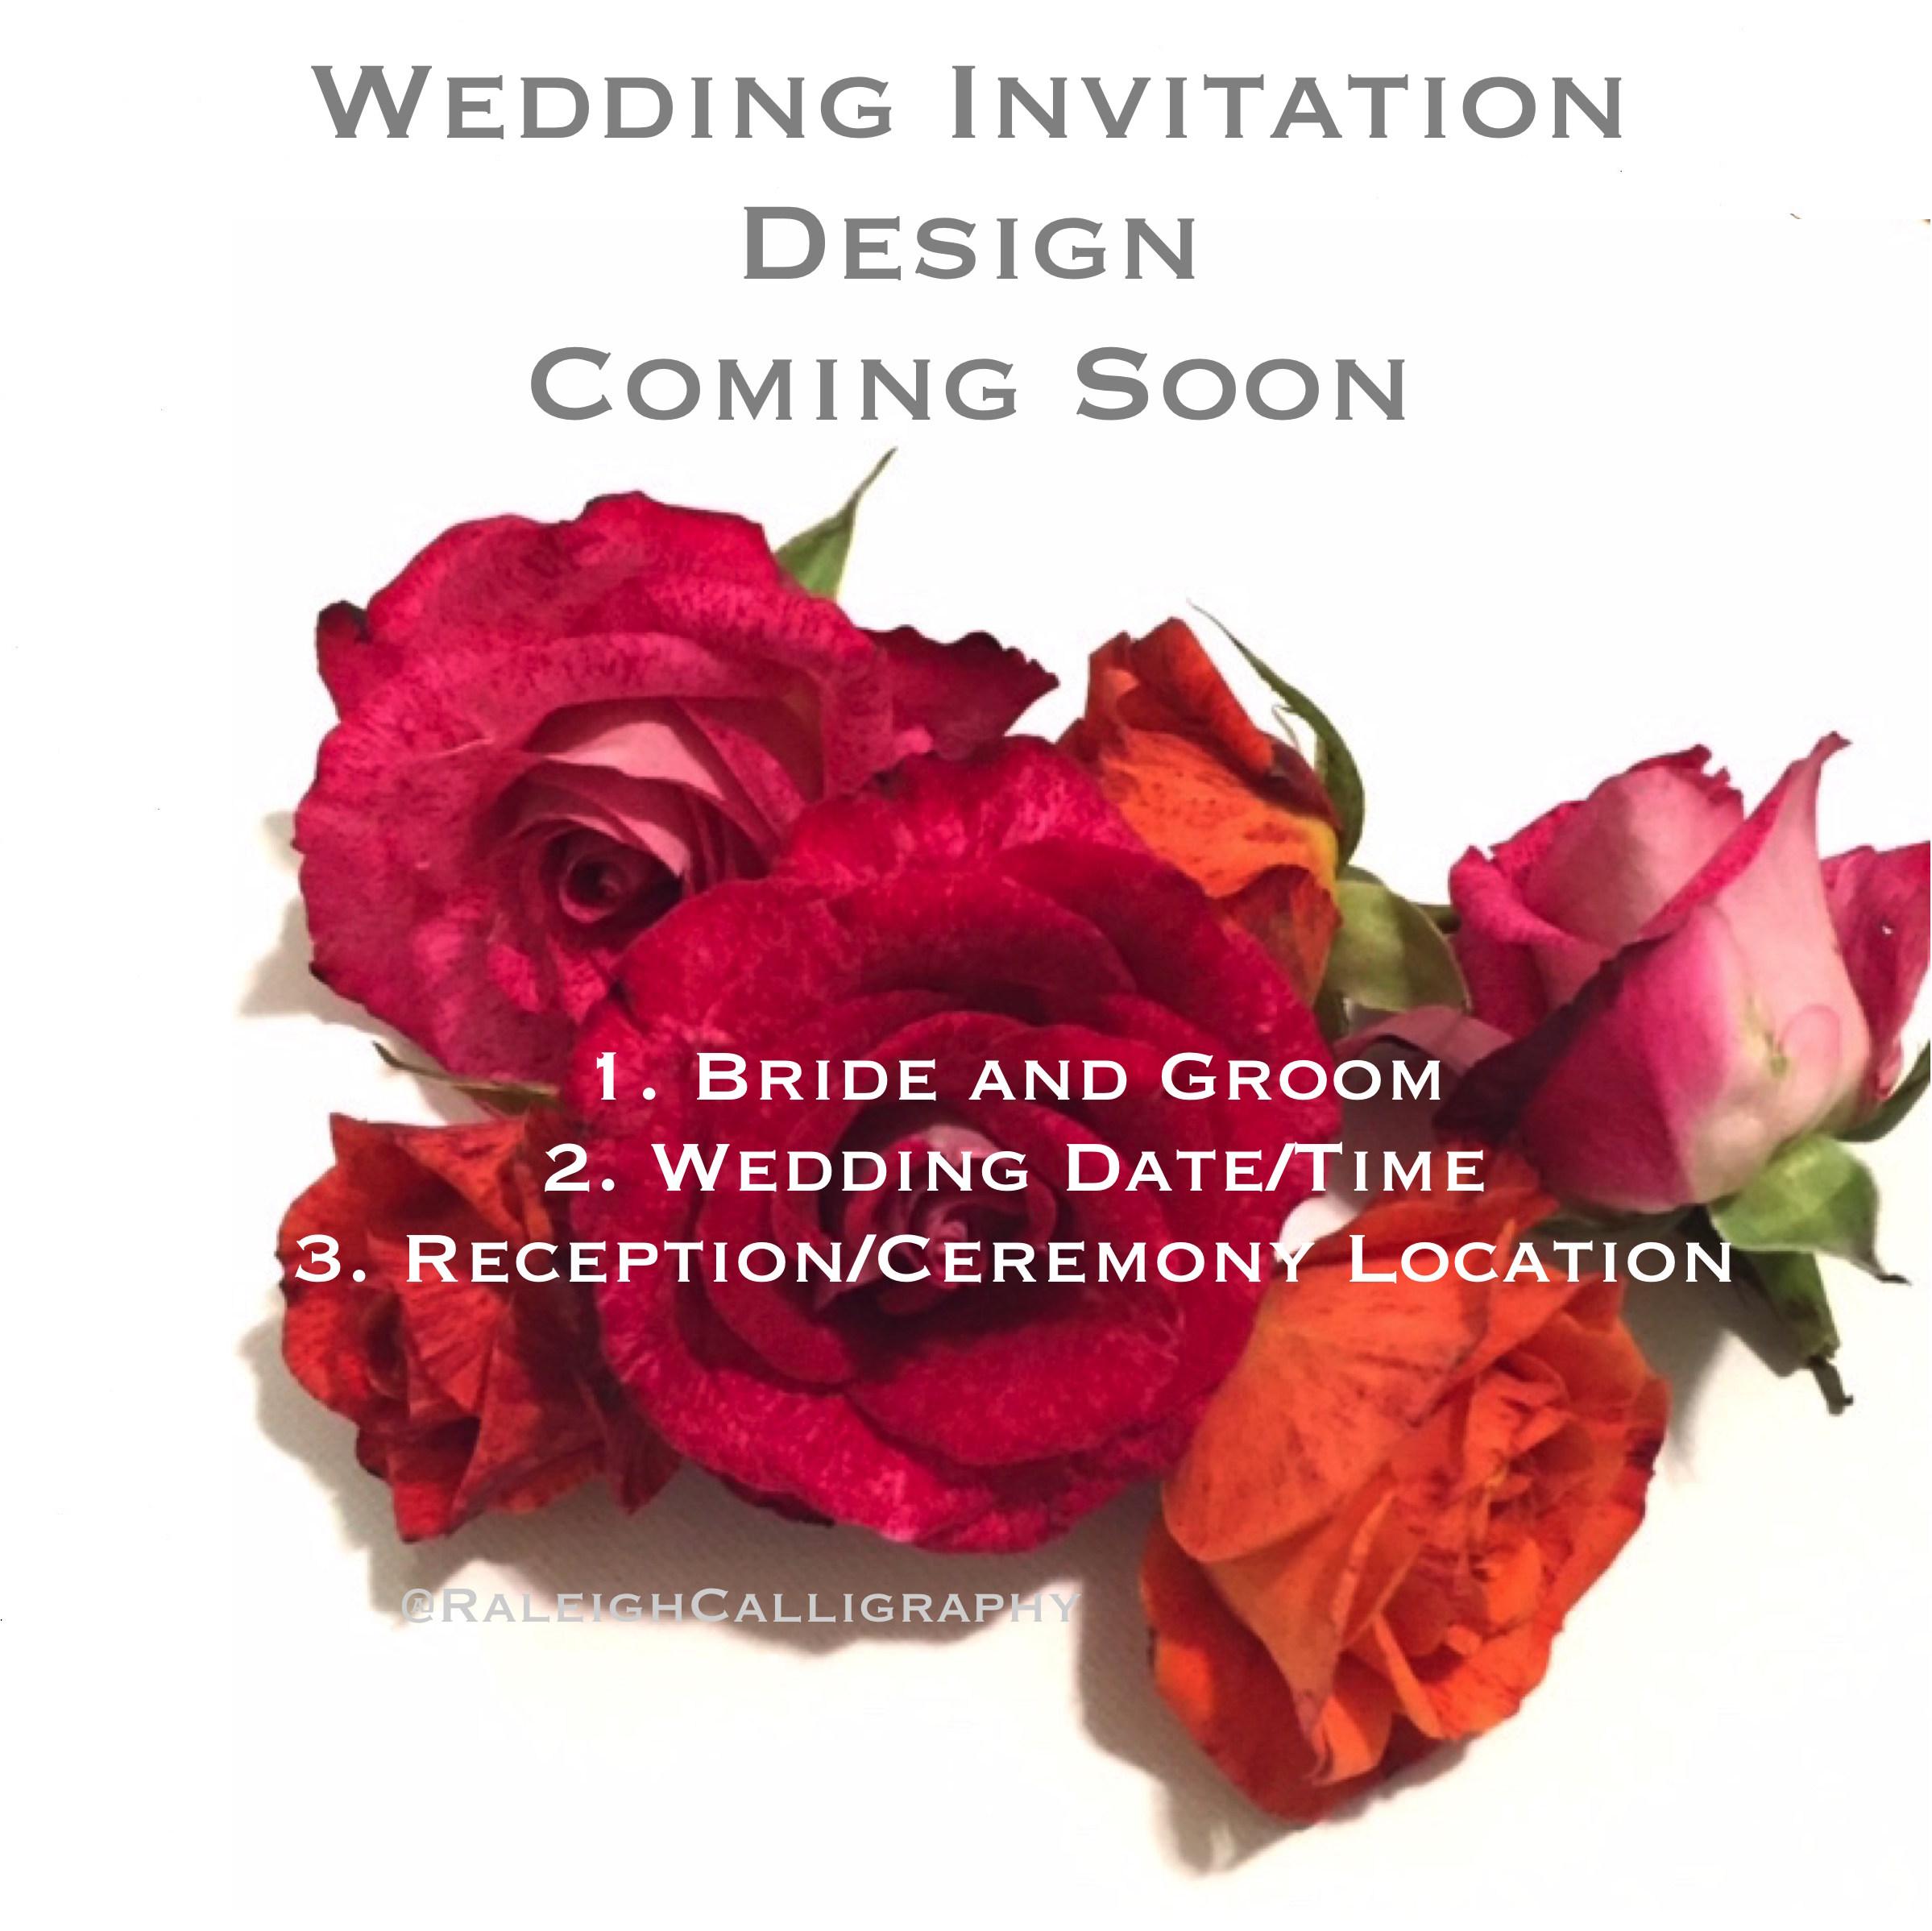 Wedding-Invite-Design-Coming-soon-IG.jpg